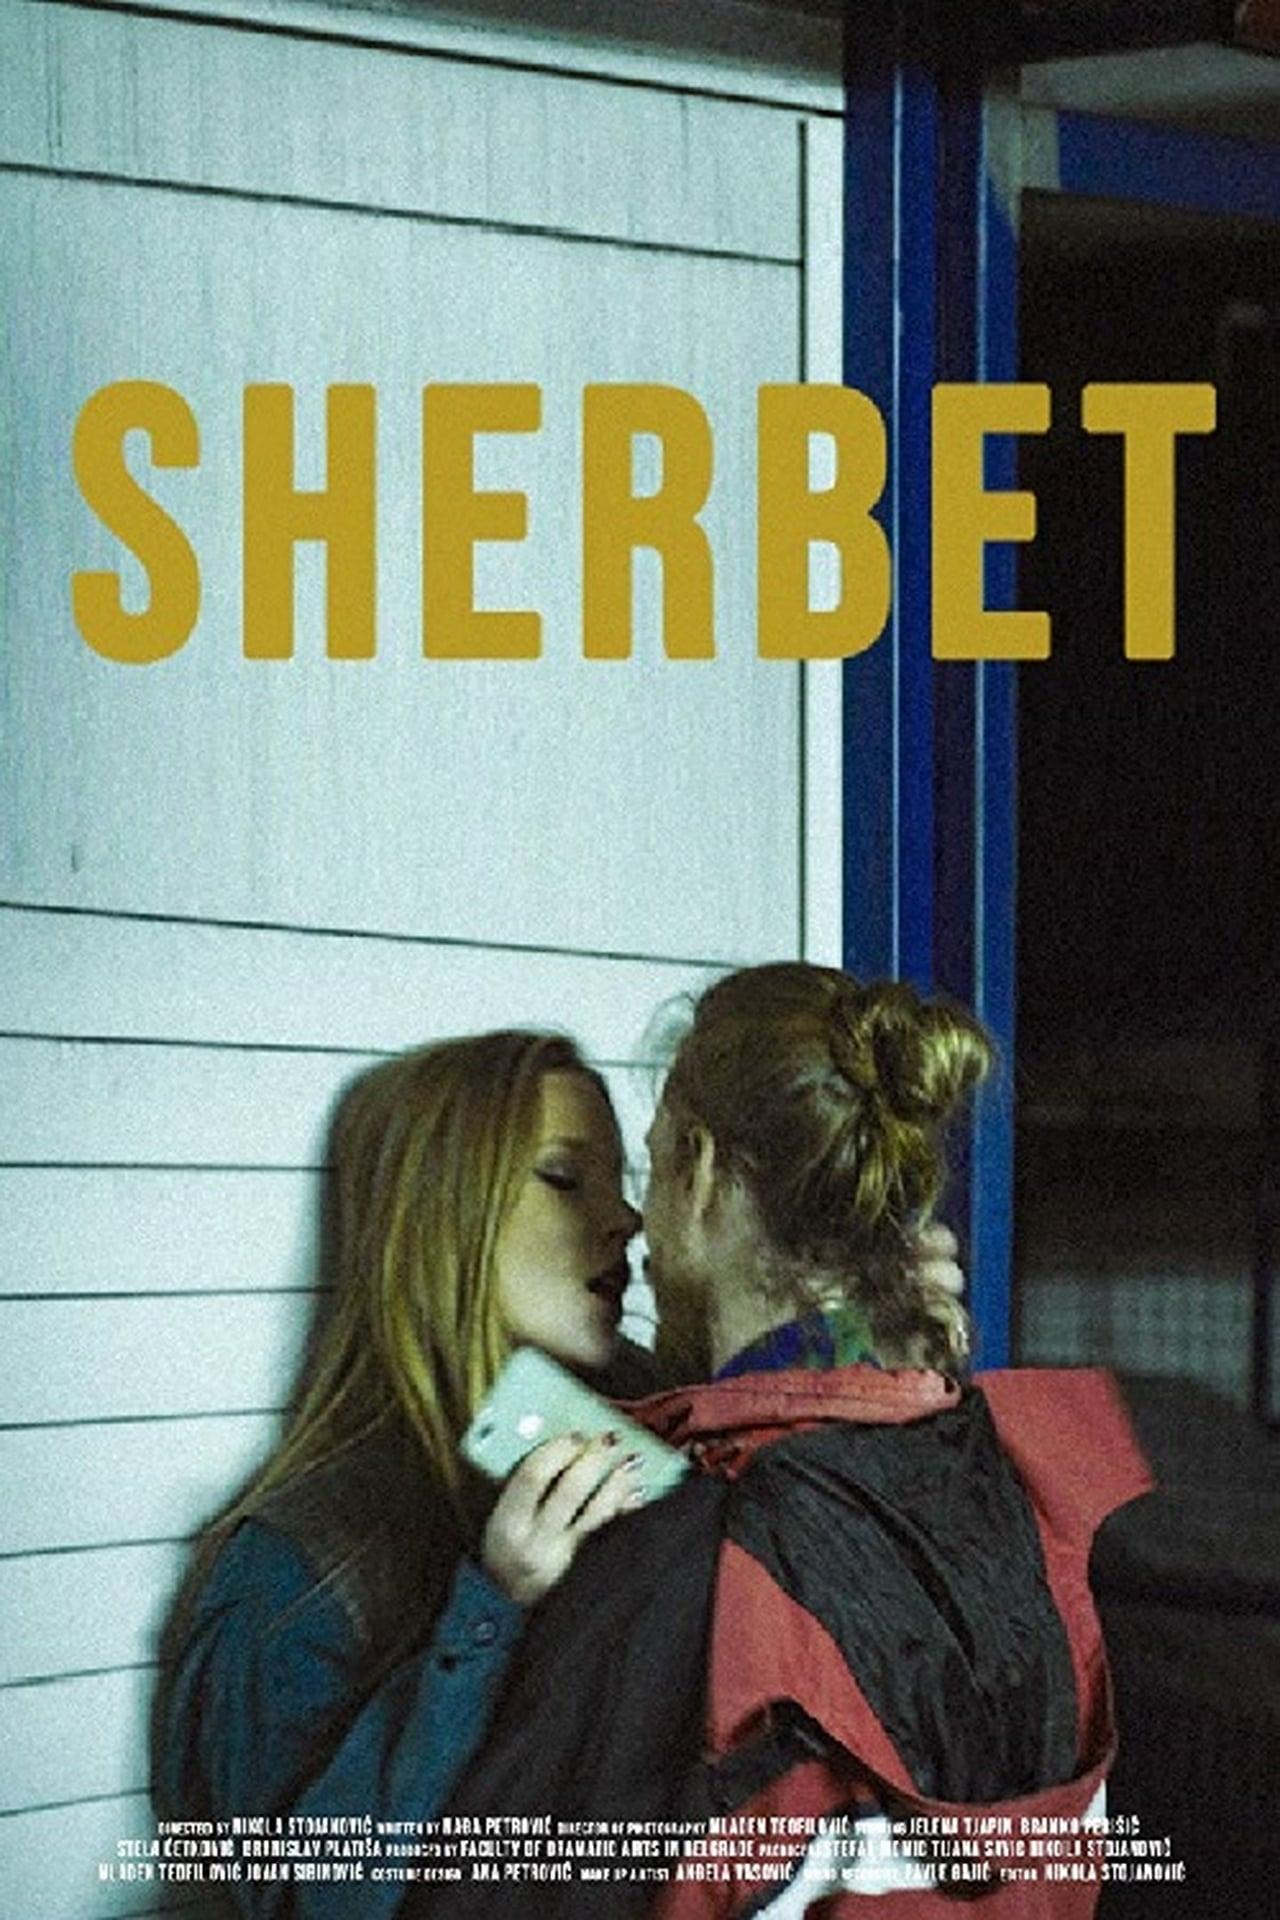 Sherbet